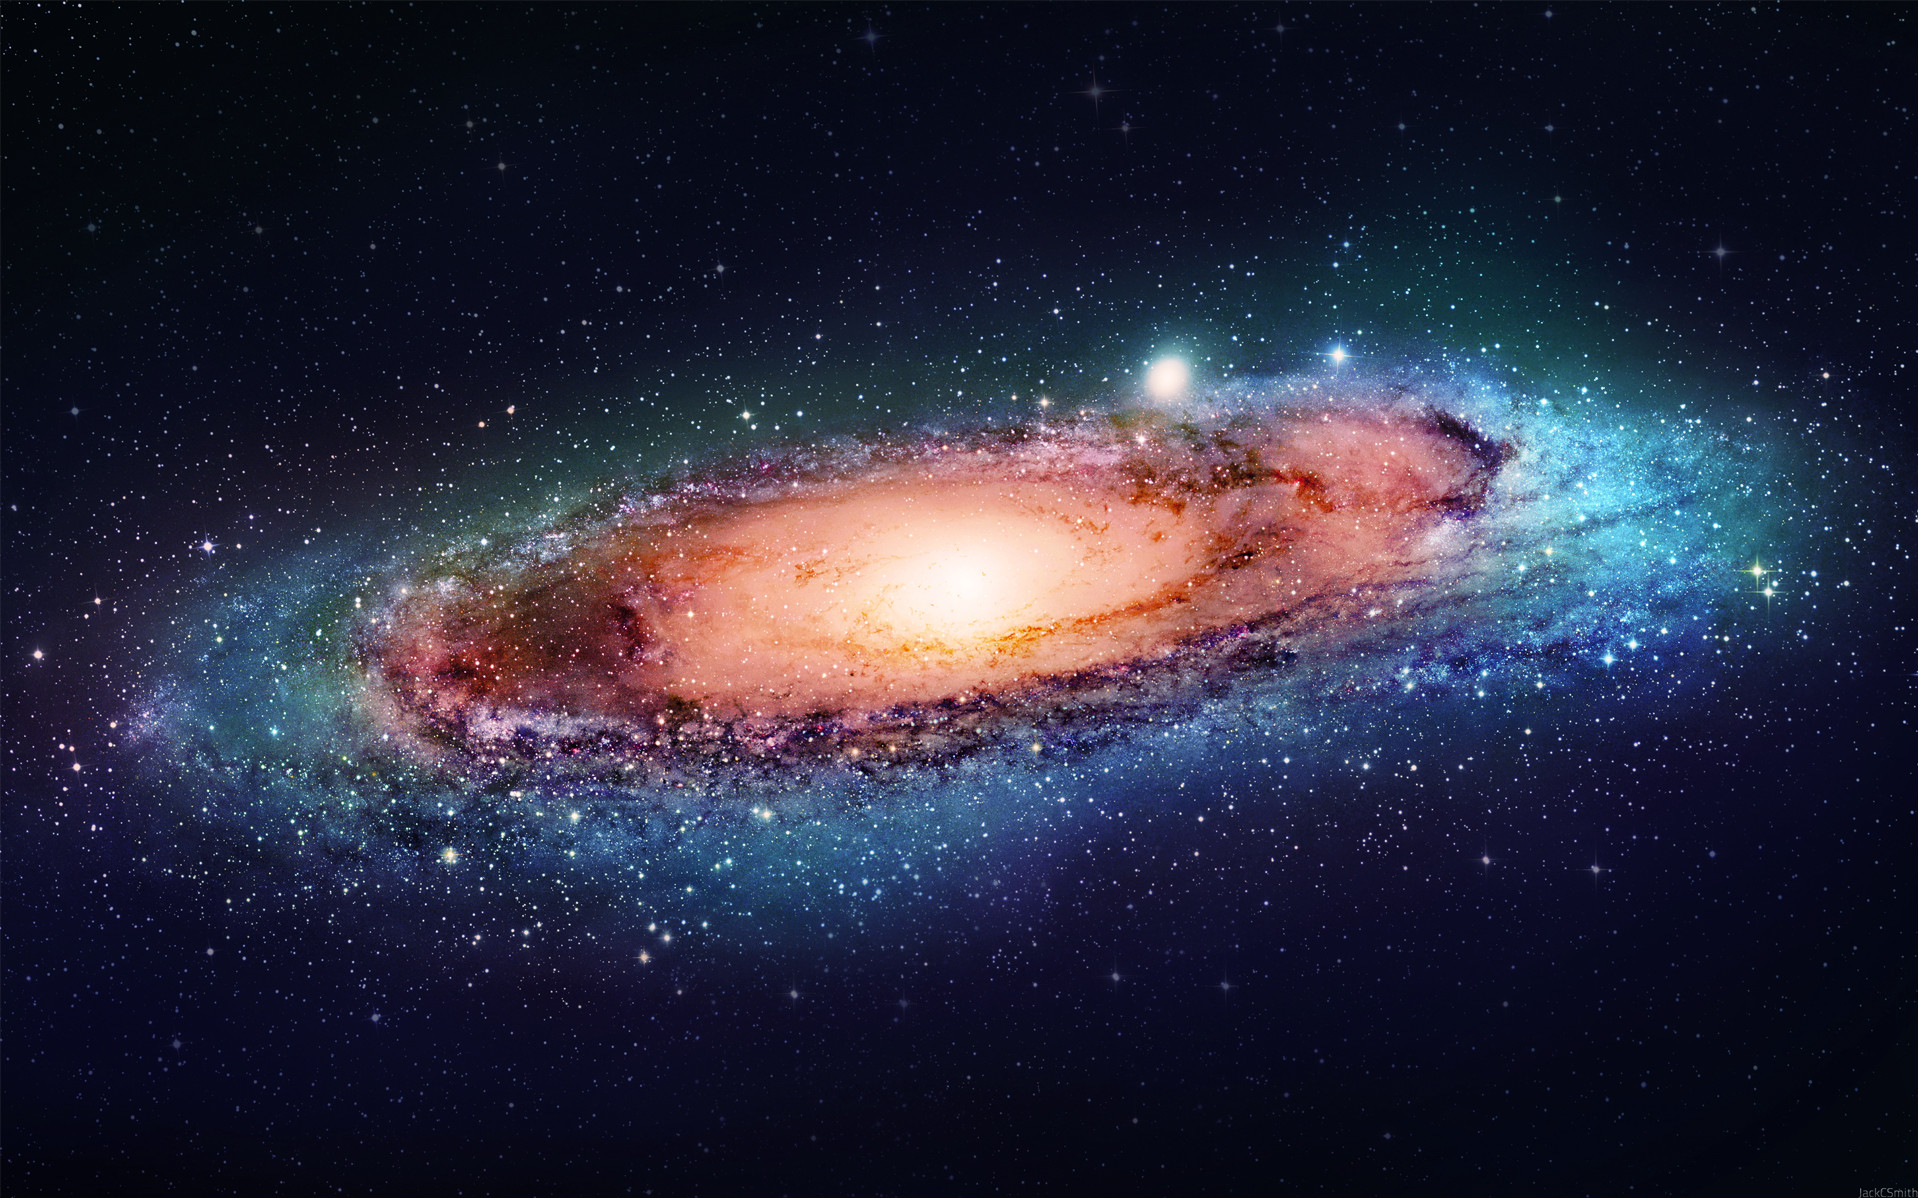 11 Andromeda Galaxy Wallpaper HD Photos Collections